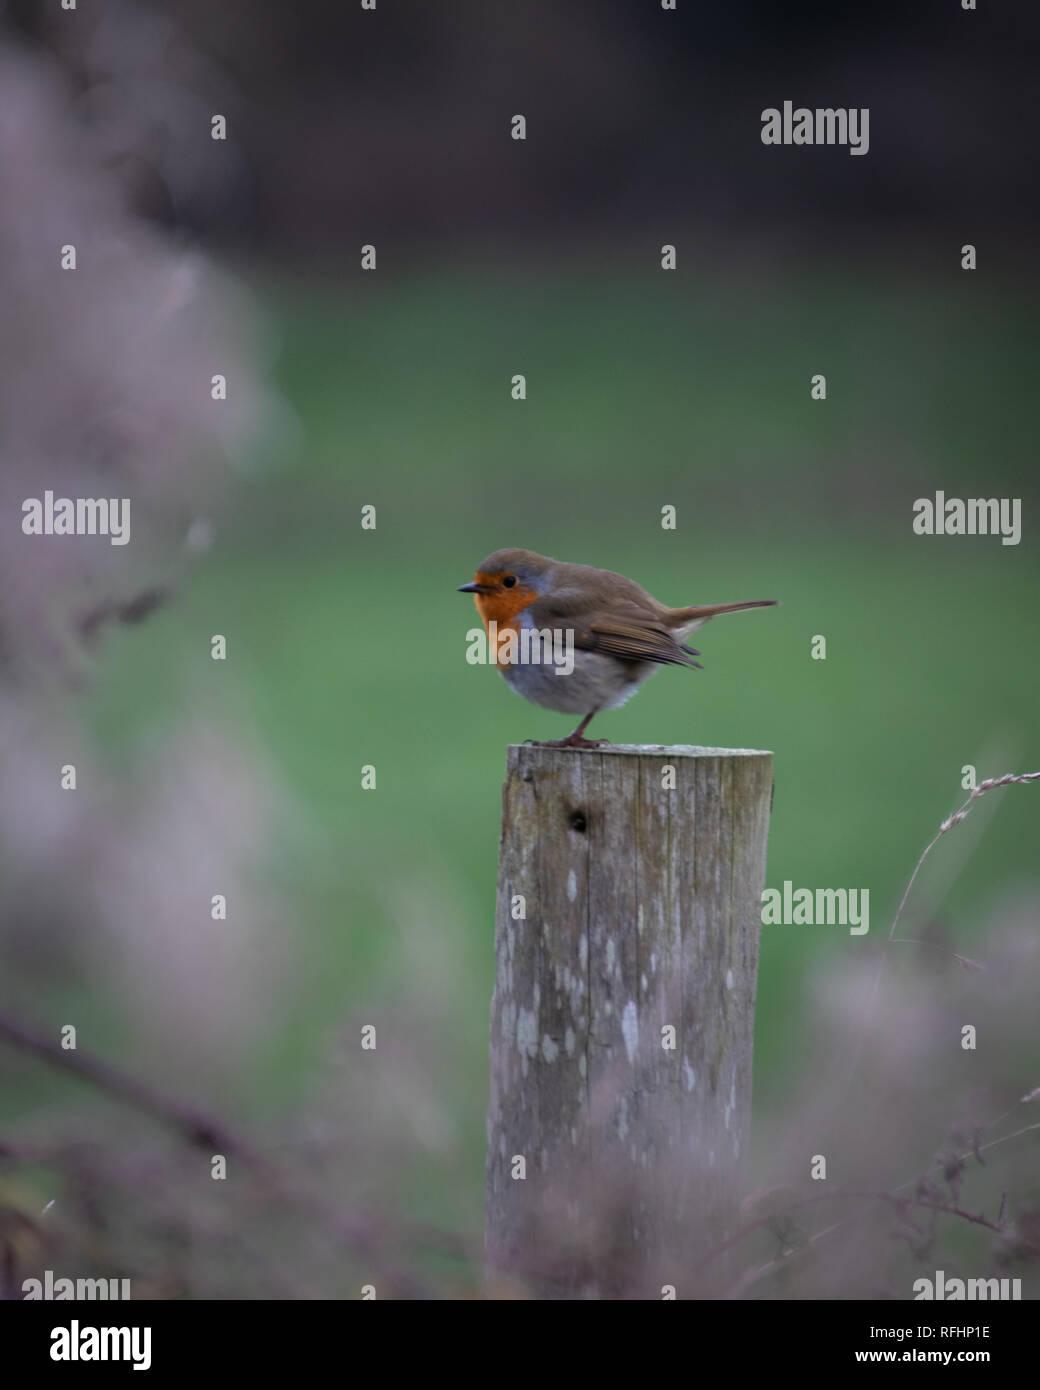 a single European robin sat on a fence post - Stock Image